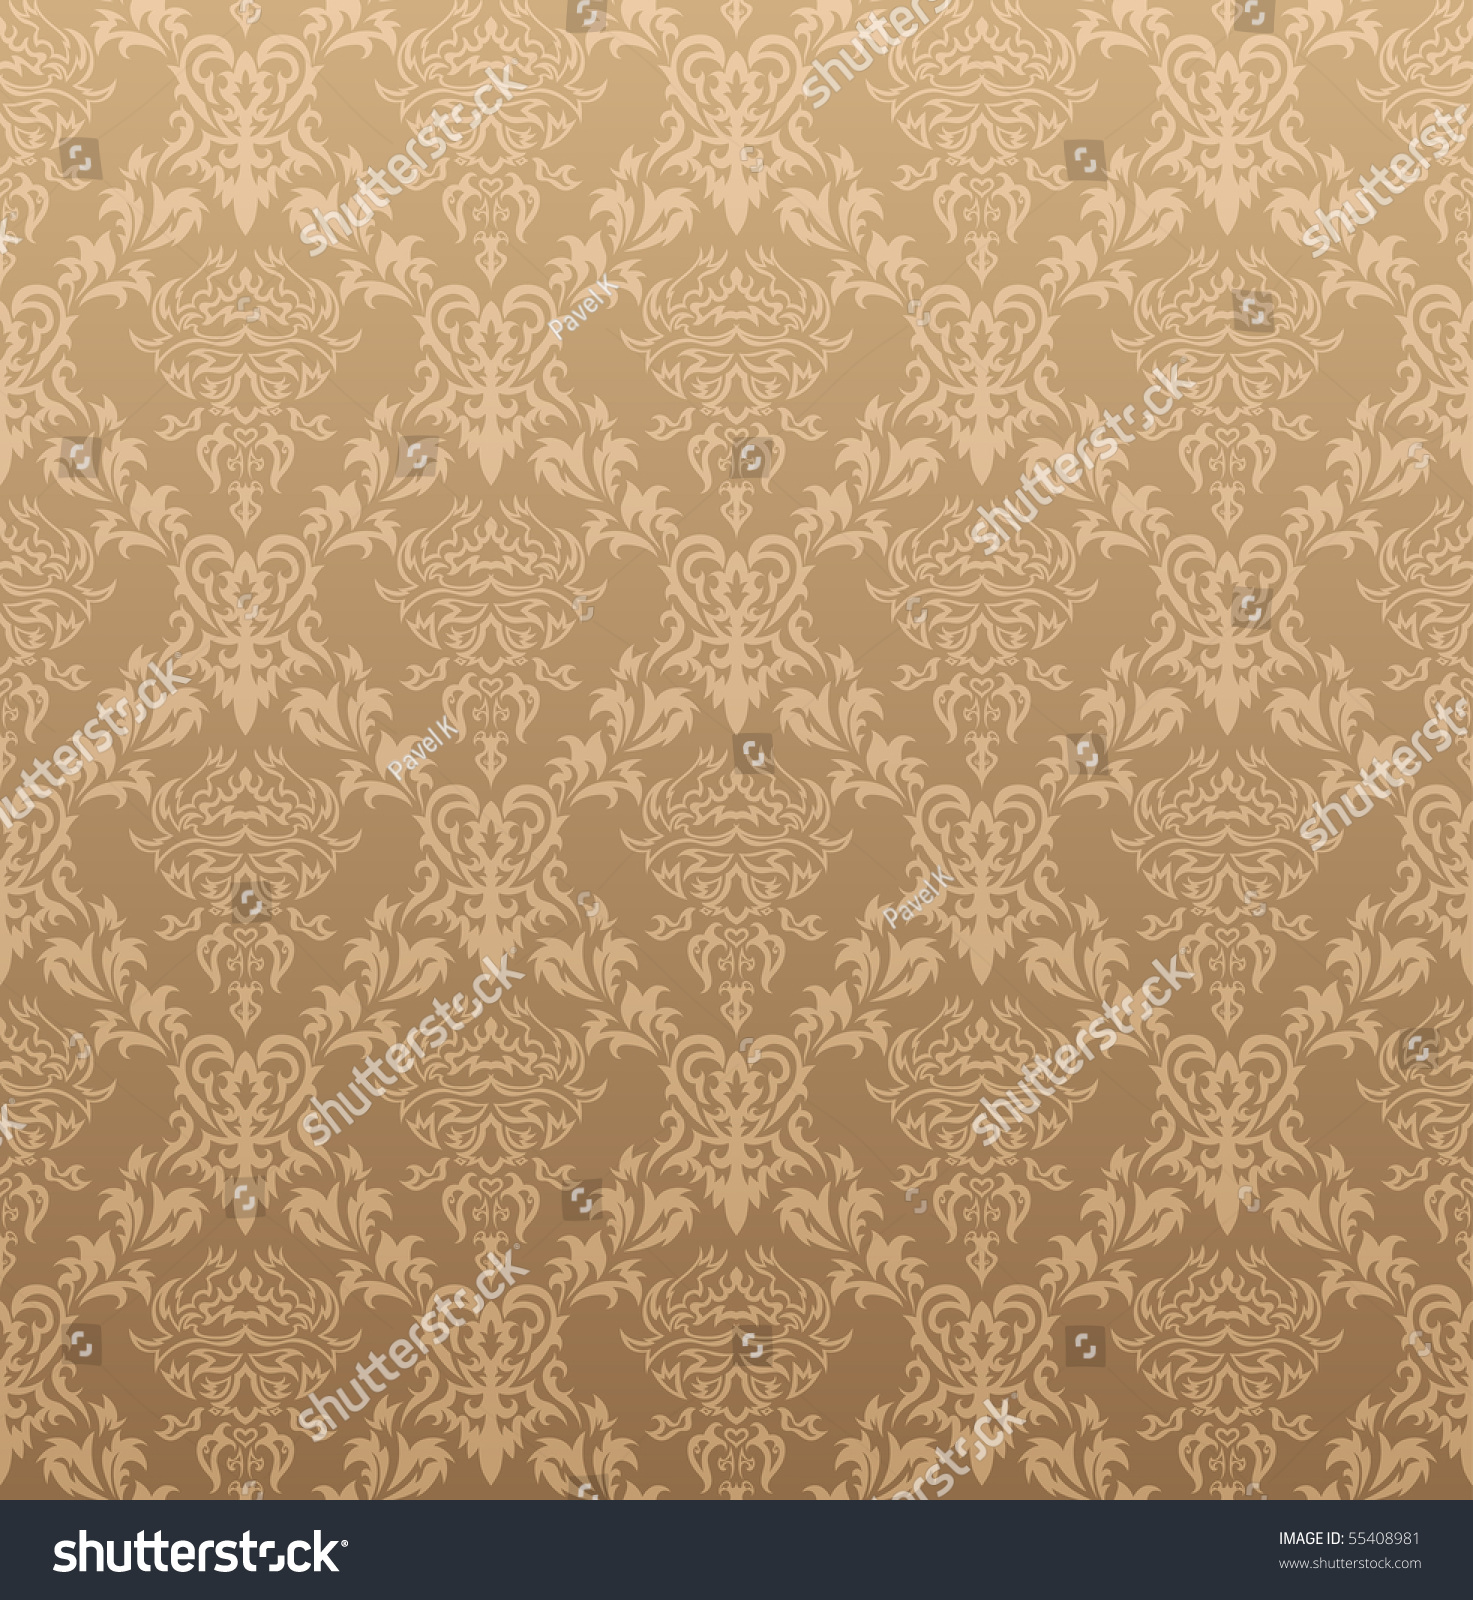 swirling royal pattern wallpaper - photo #14